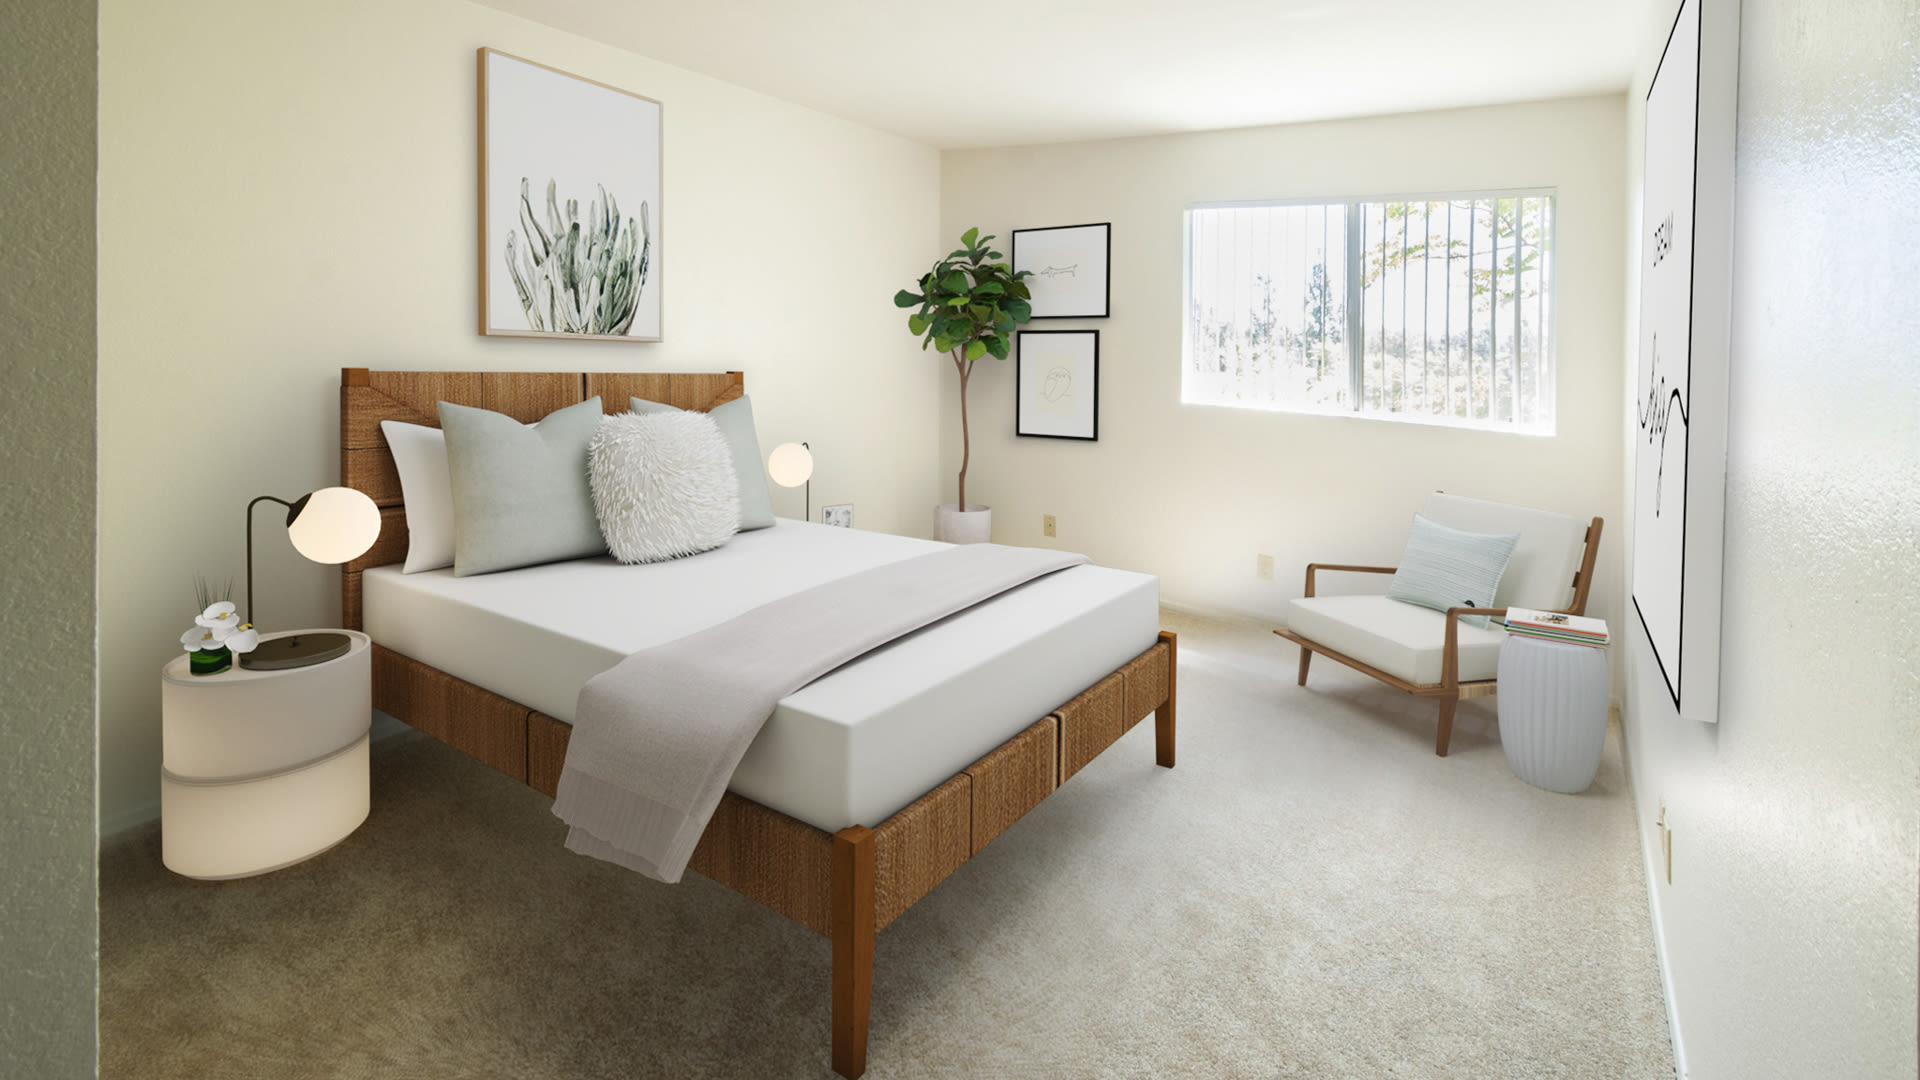 Siena Terrace Apartments - Carpeted Bedroom